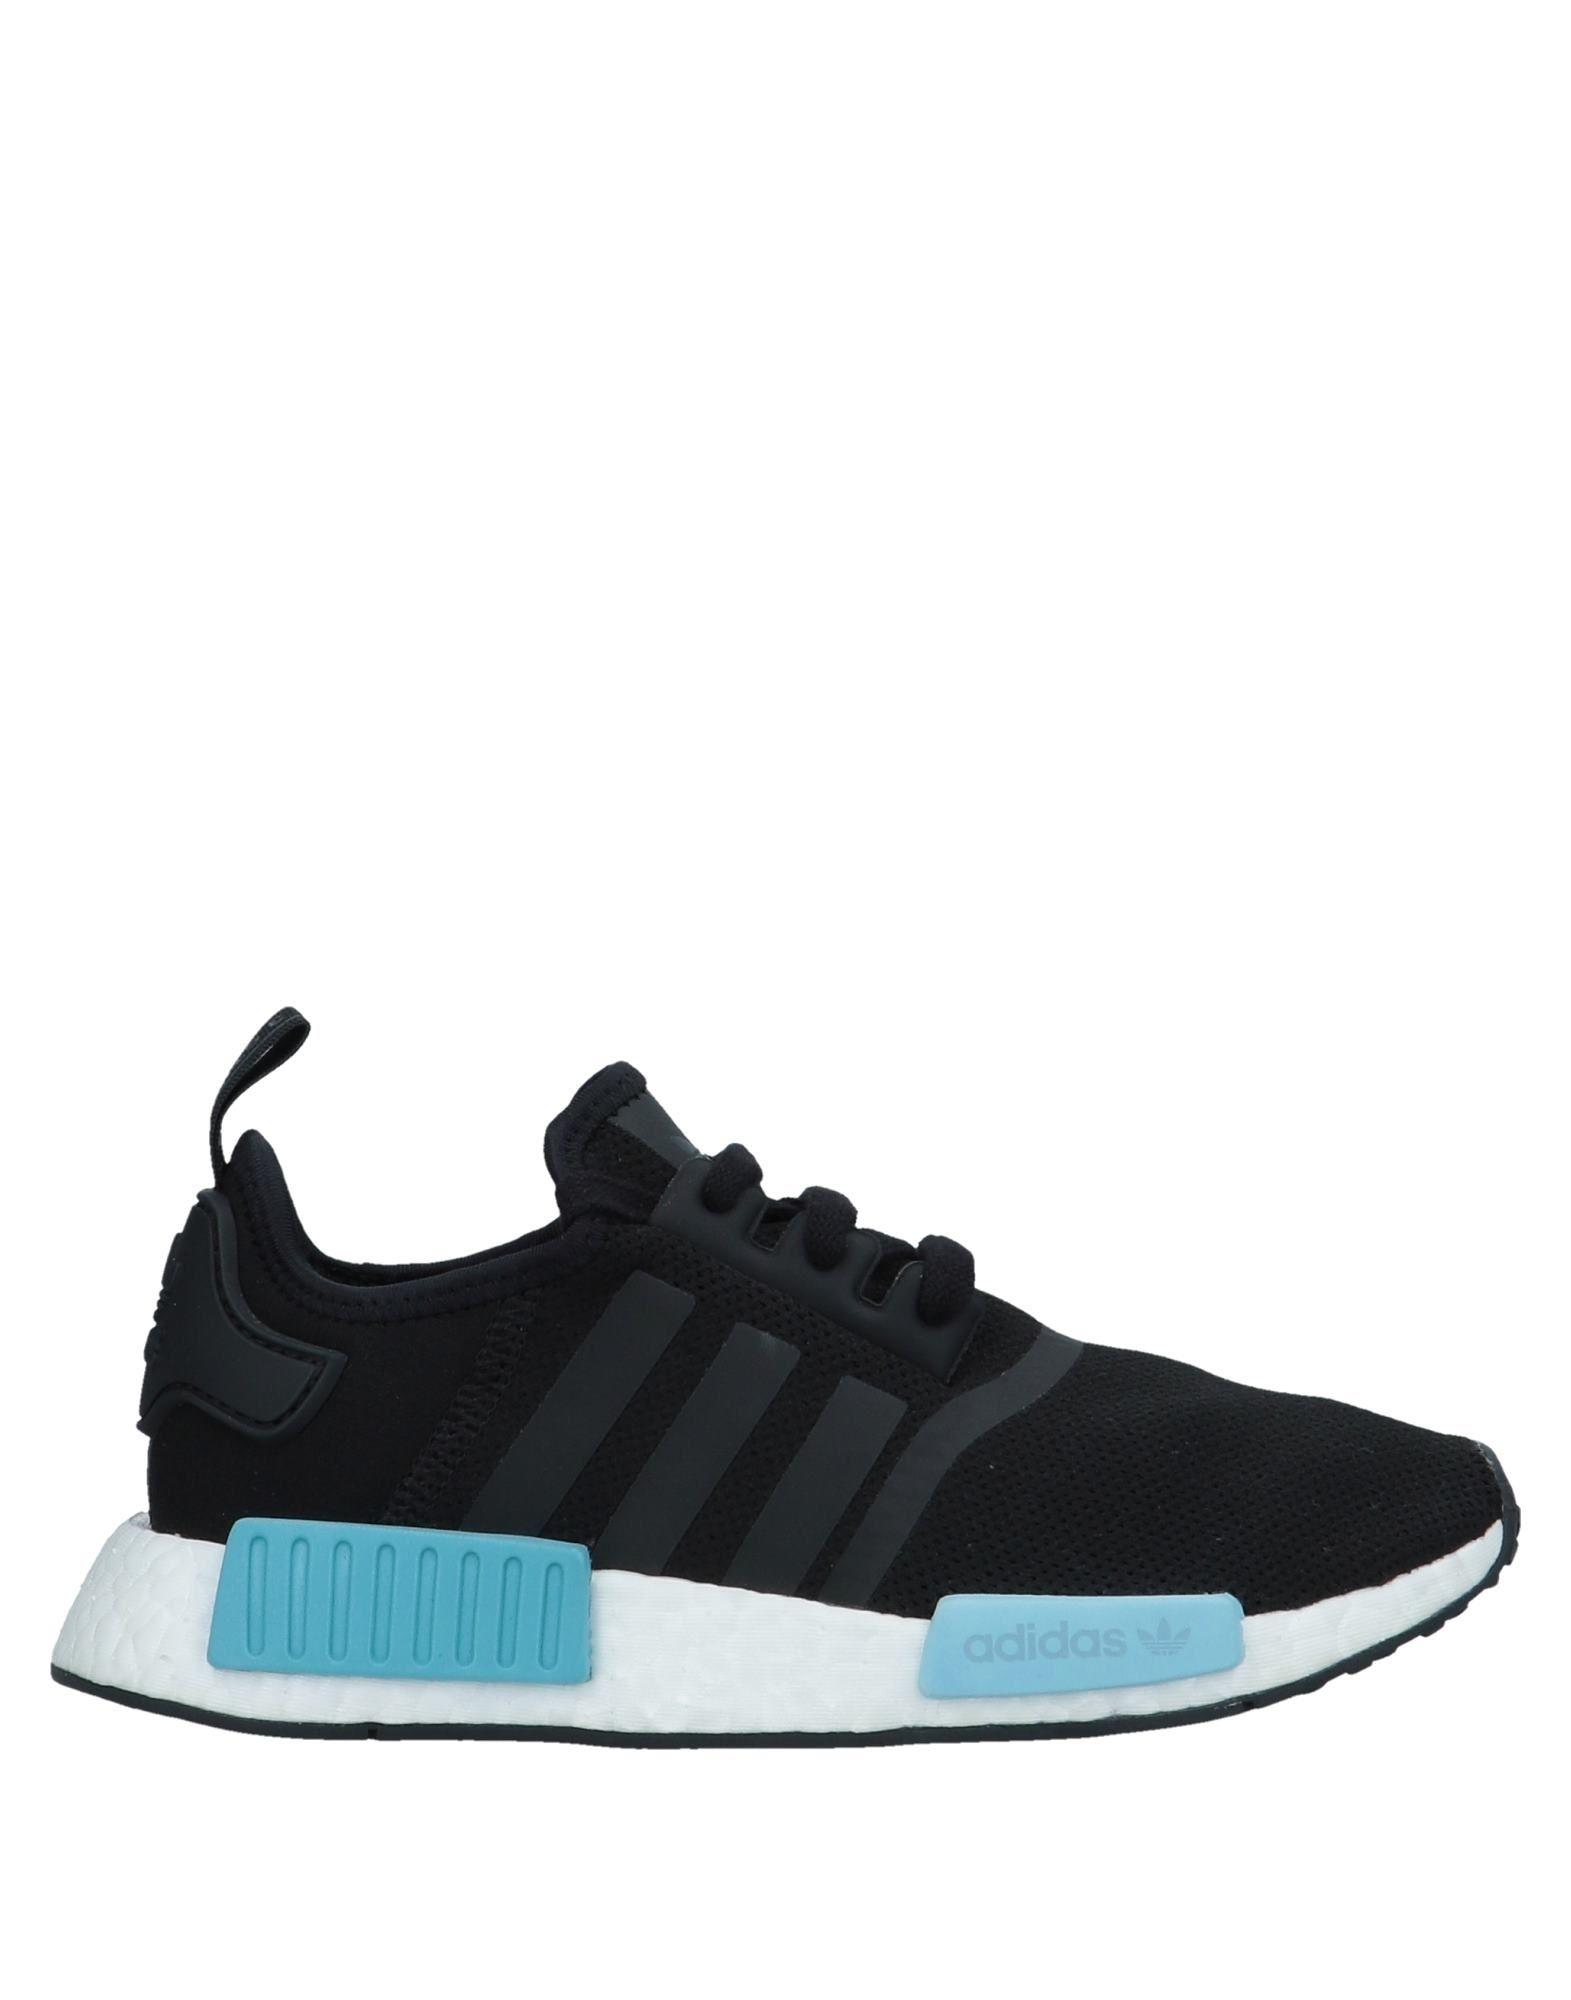 Adidas Originals Sneakers - - - Women Adidas Originals Sneakers online on  United Kingdom - 11570608VA a799ac